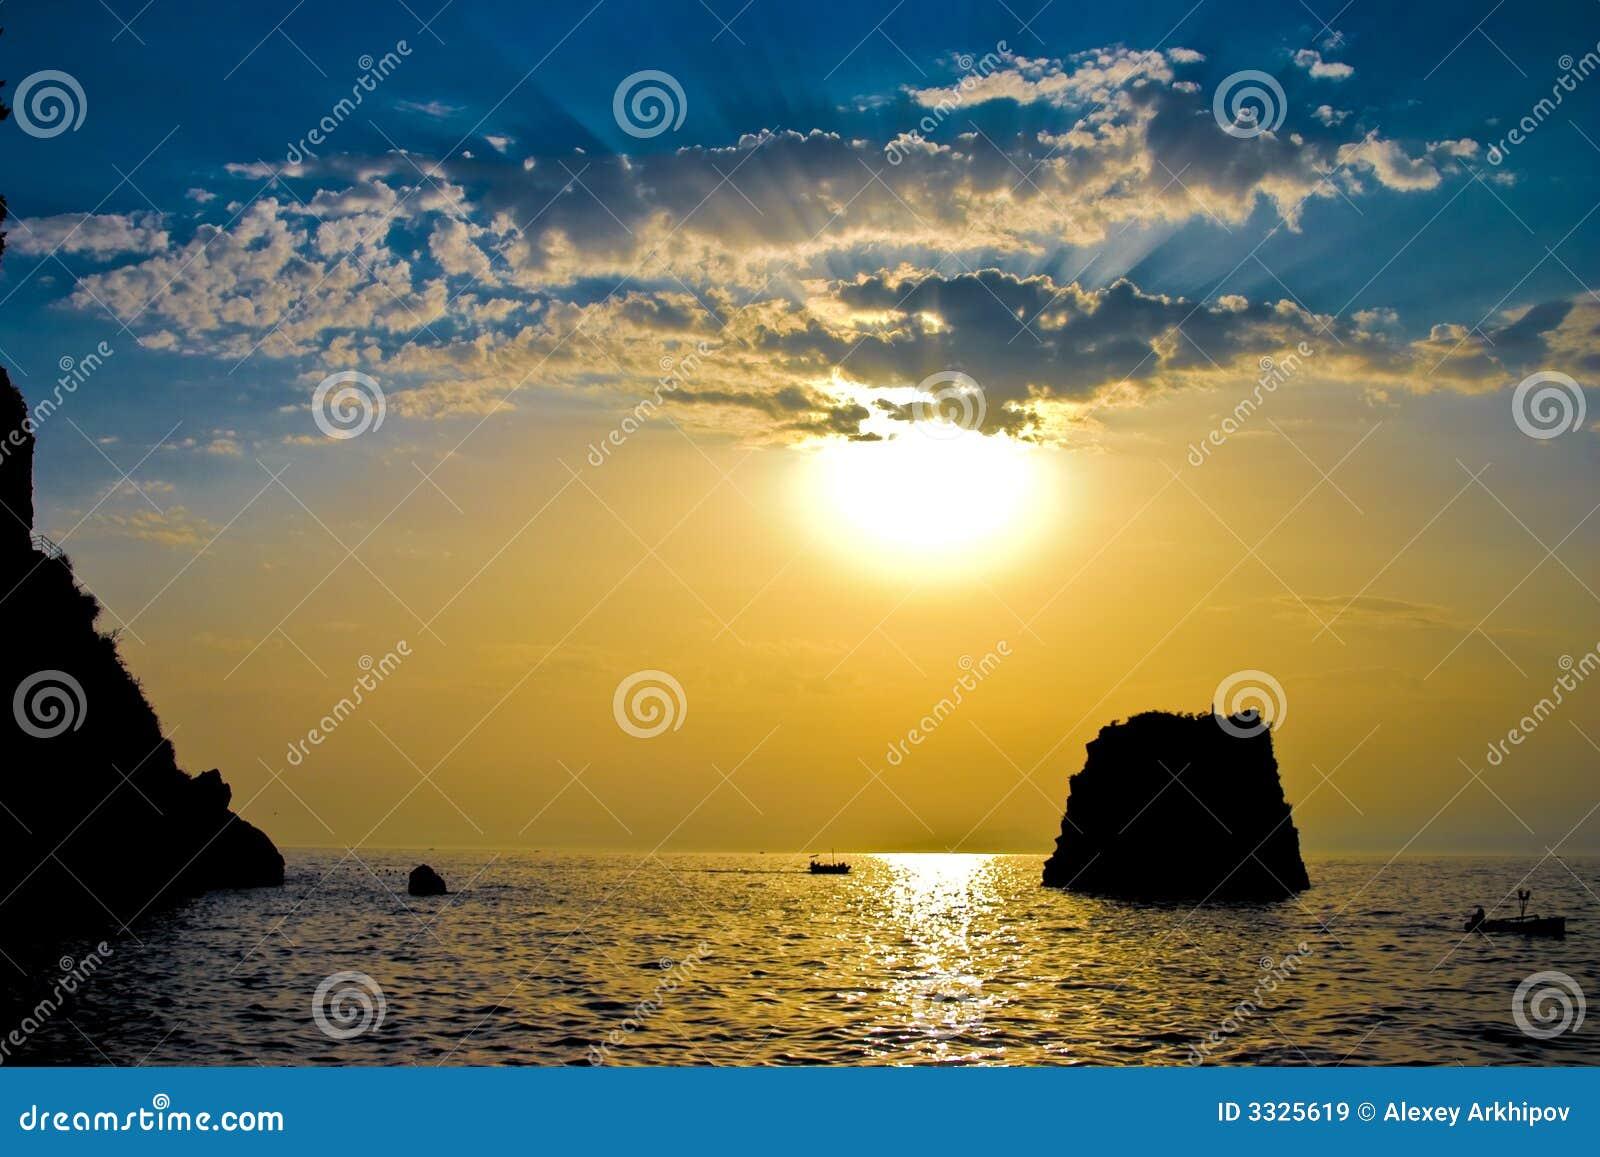 The sun above the sea